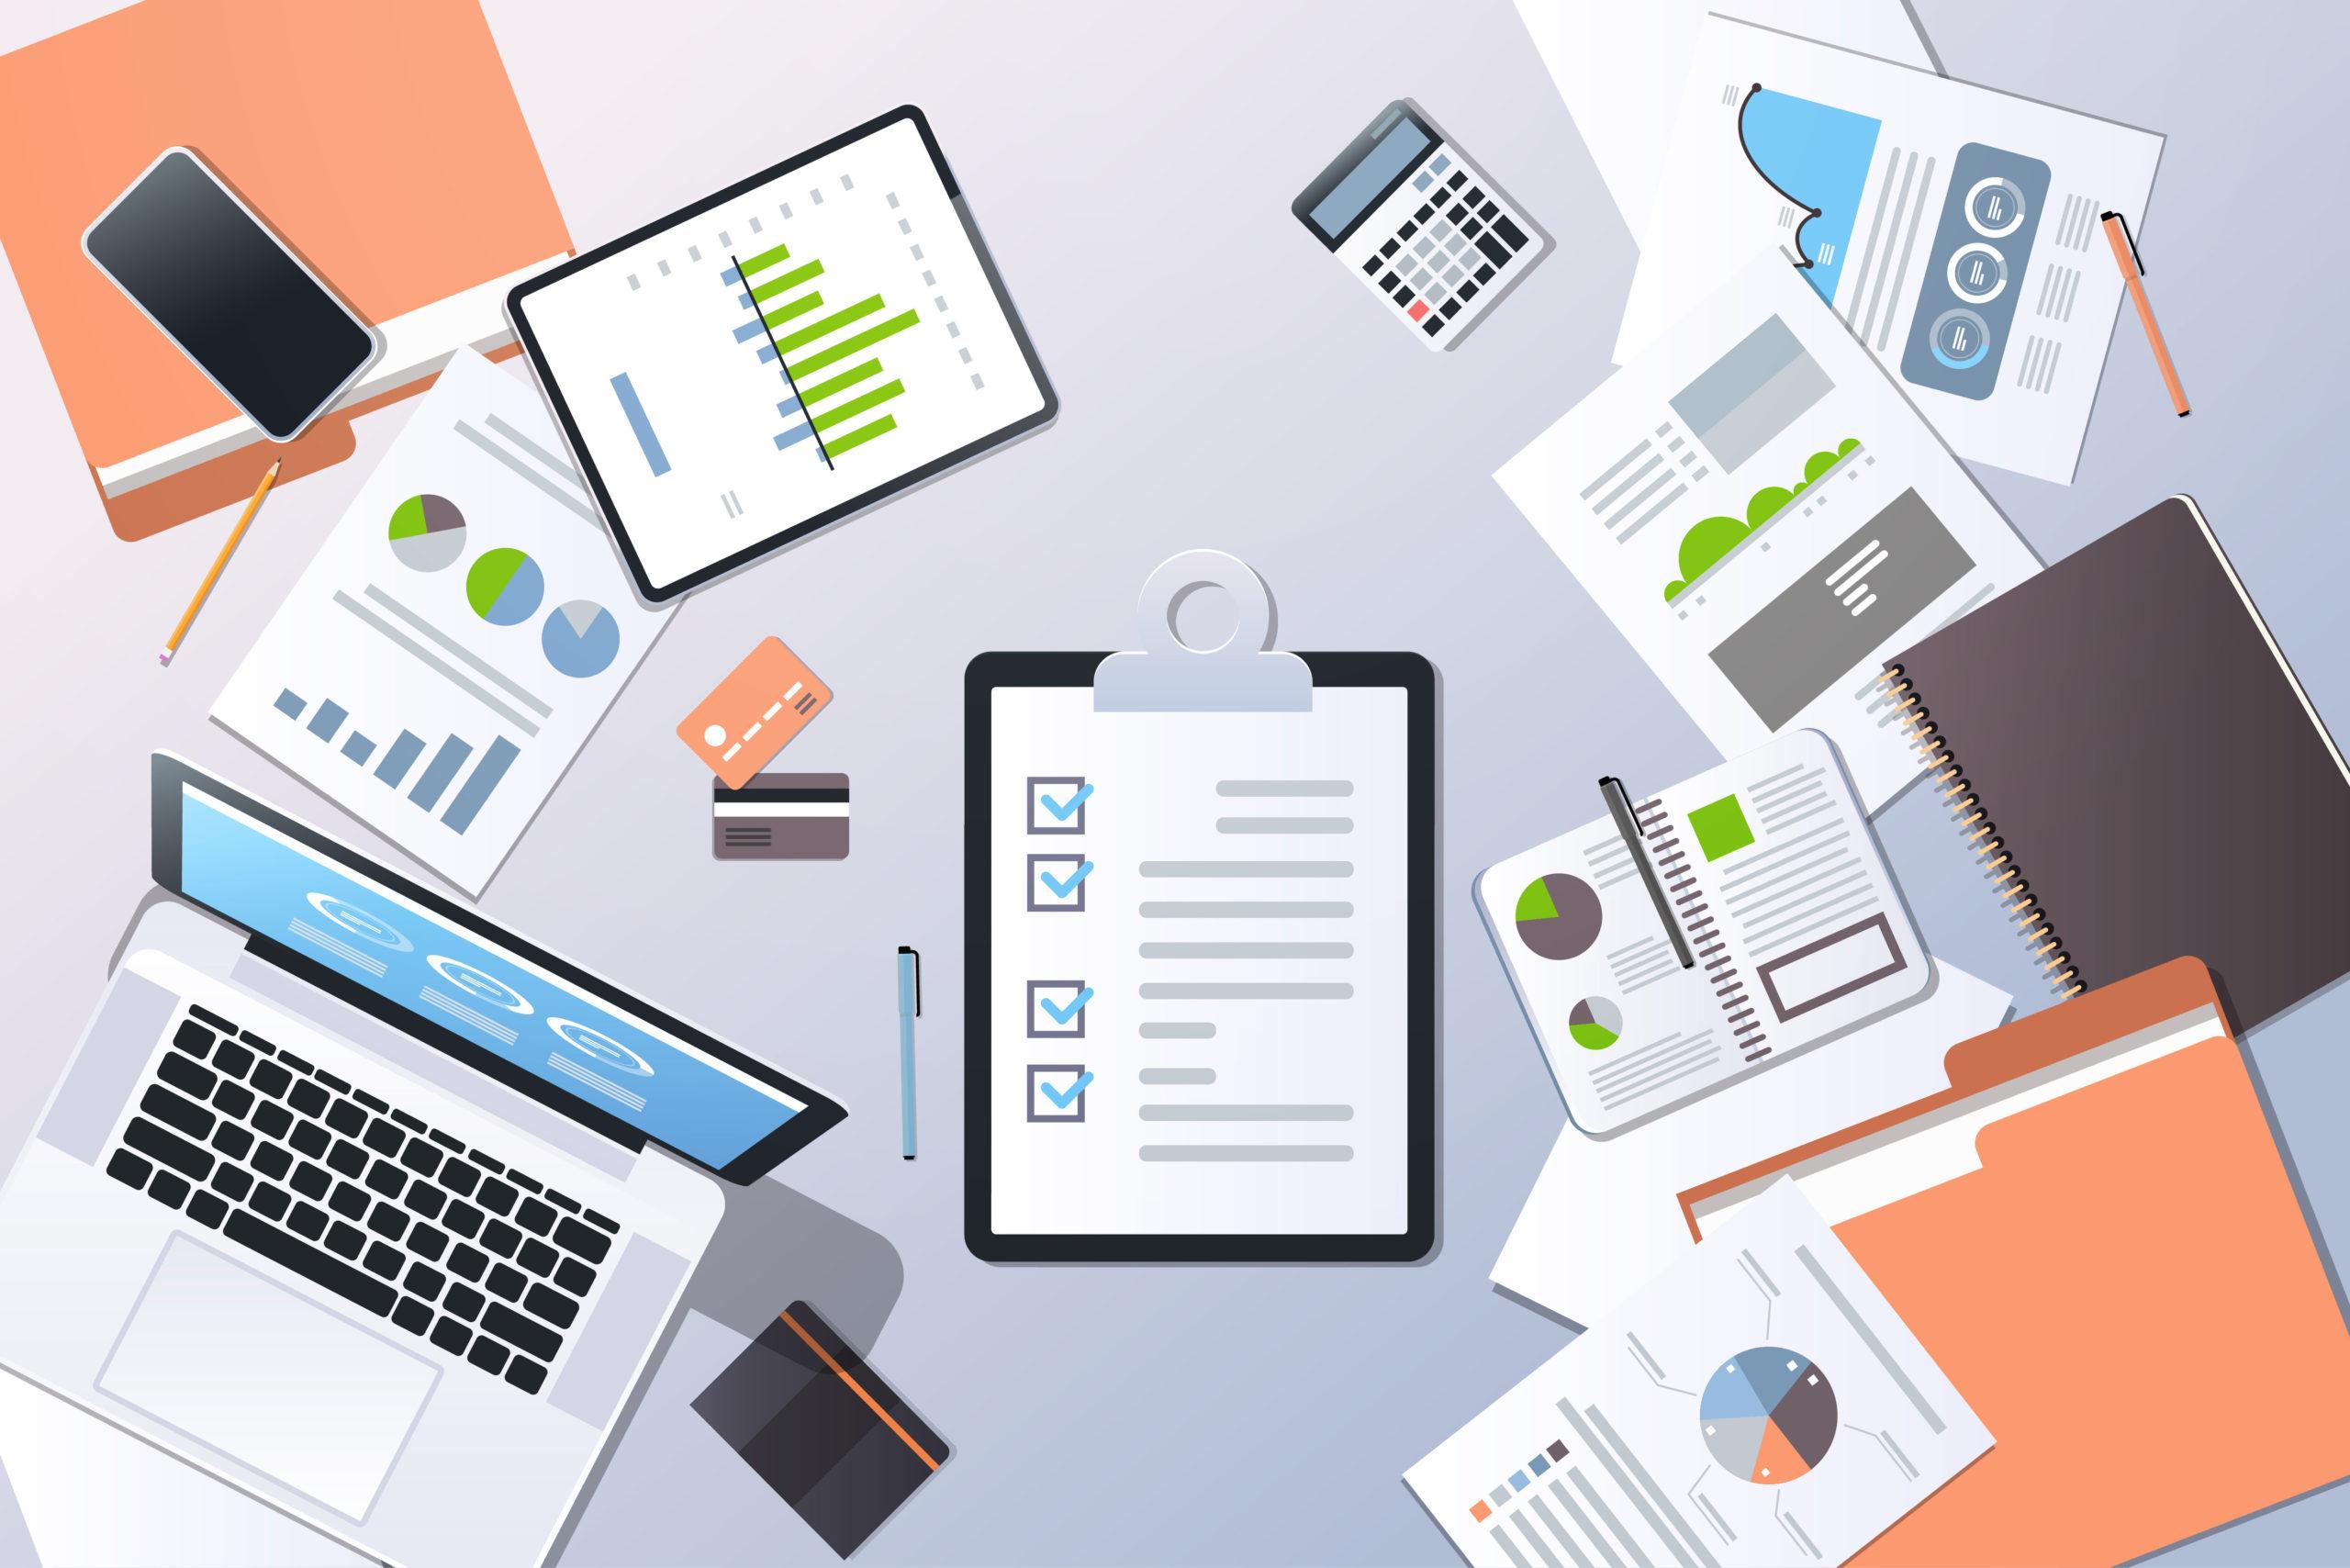 Analysis Financial Graph Business Planning Management Concept Top Angle View Desktop Laptop Smartphone Checklist Paper Documents Report Office Stuff Horizontal